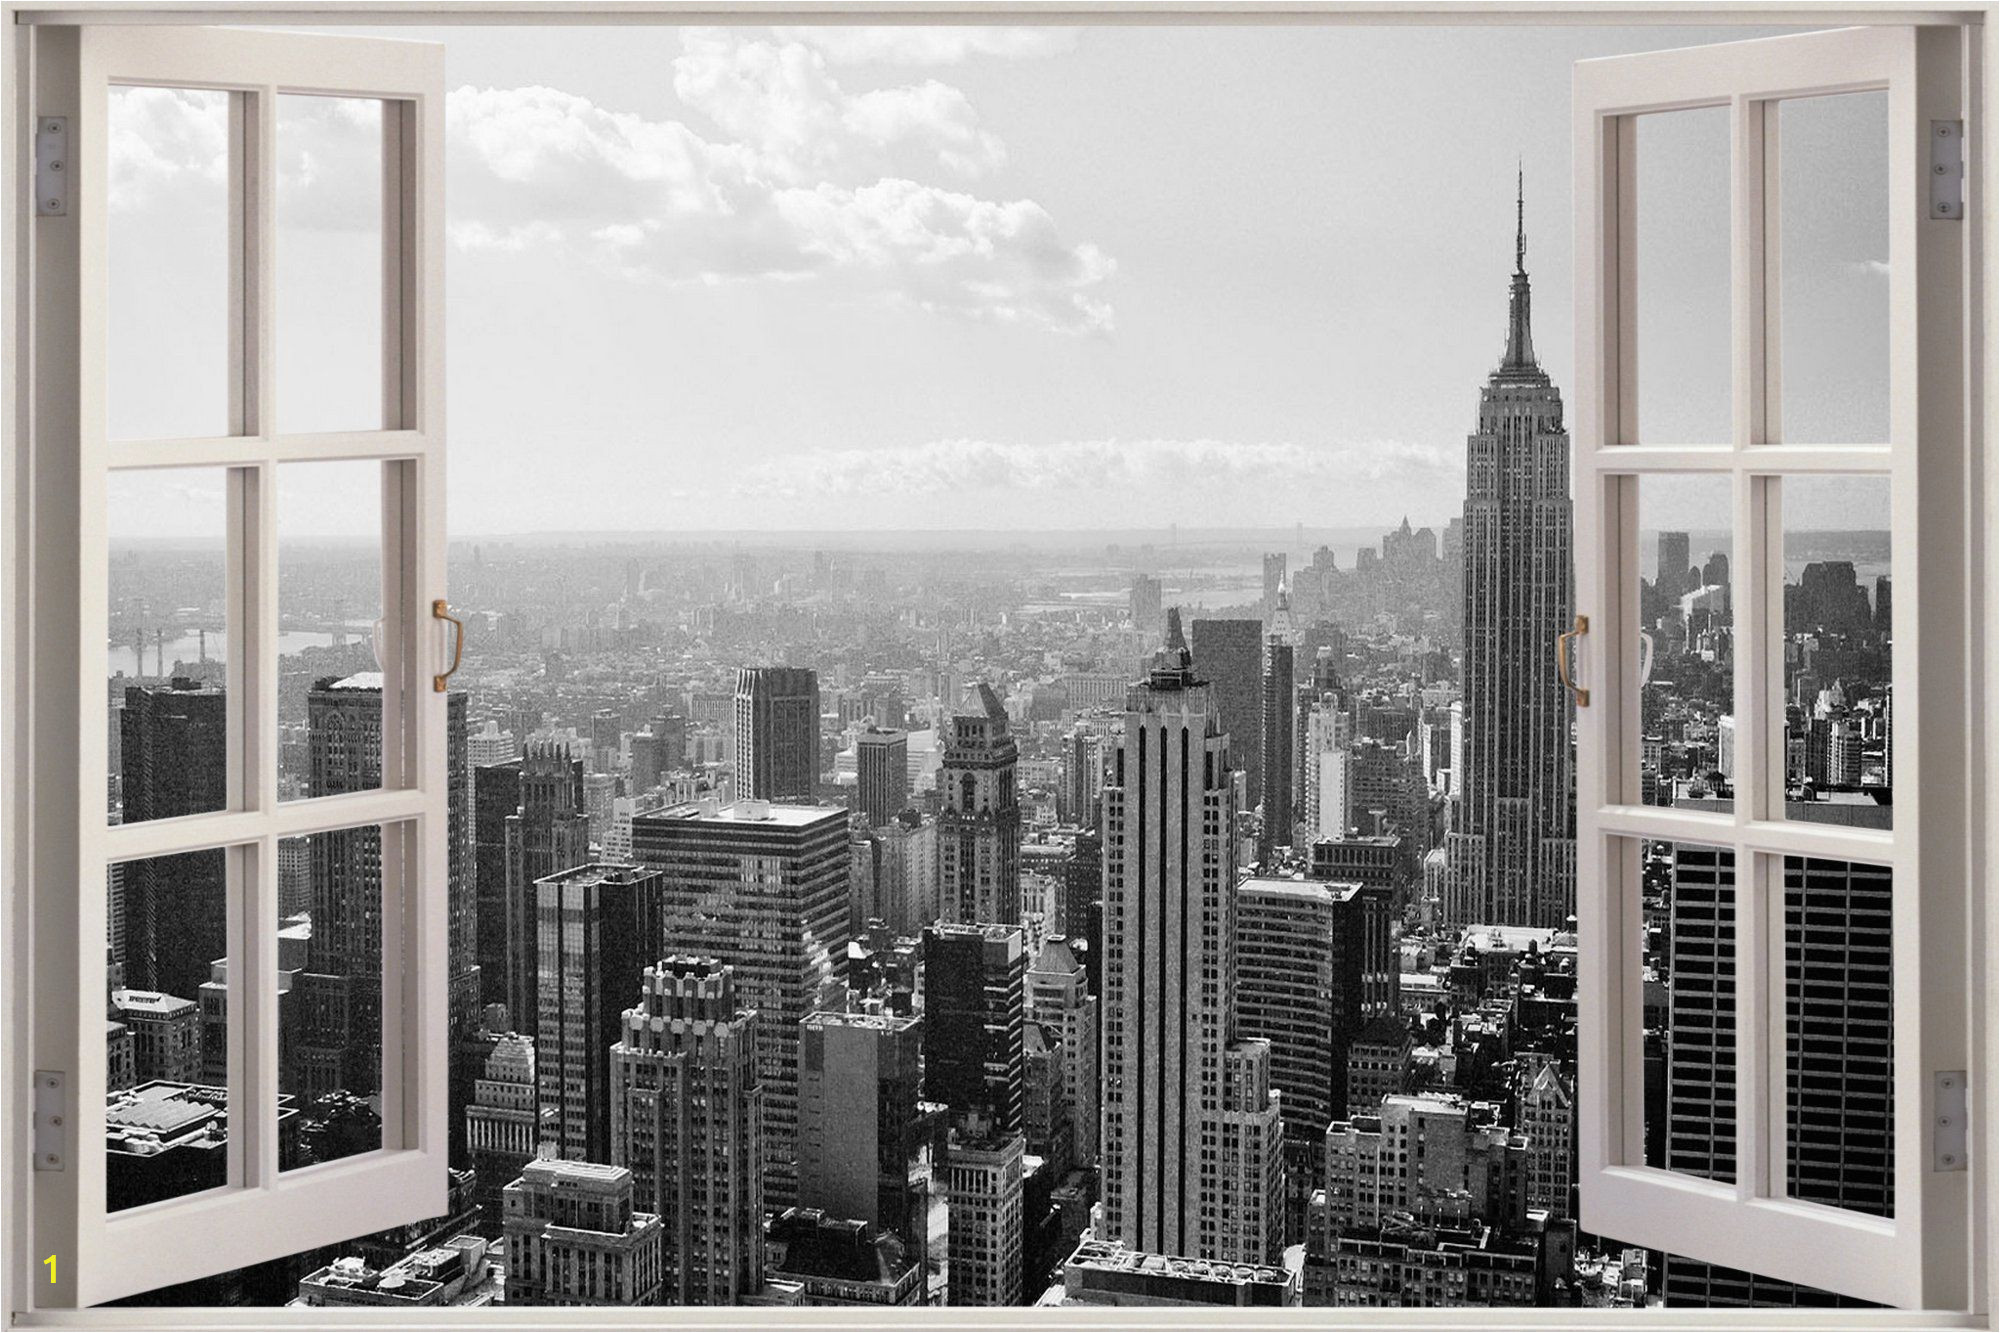 New York Wall Mural Wallpaper Huge 3d Window New York City View Wall Stickers Mural